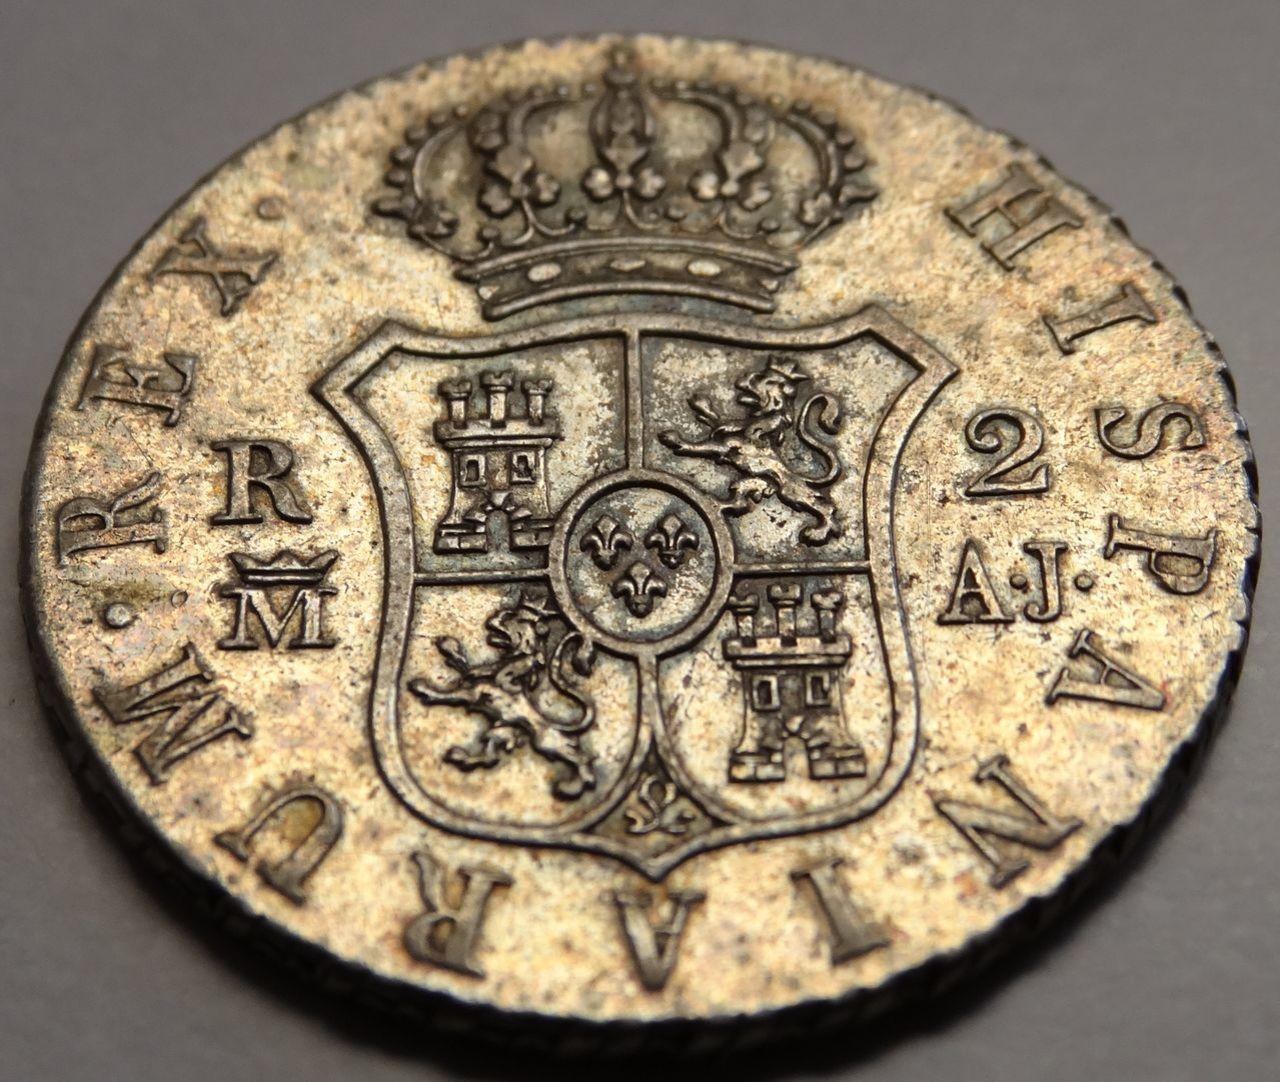 2 reales 1831 Madrid AJ, Fernando VII DEDICADA A Flekyangel 2_reales_reverso_1813